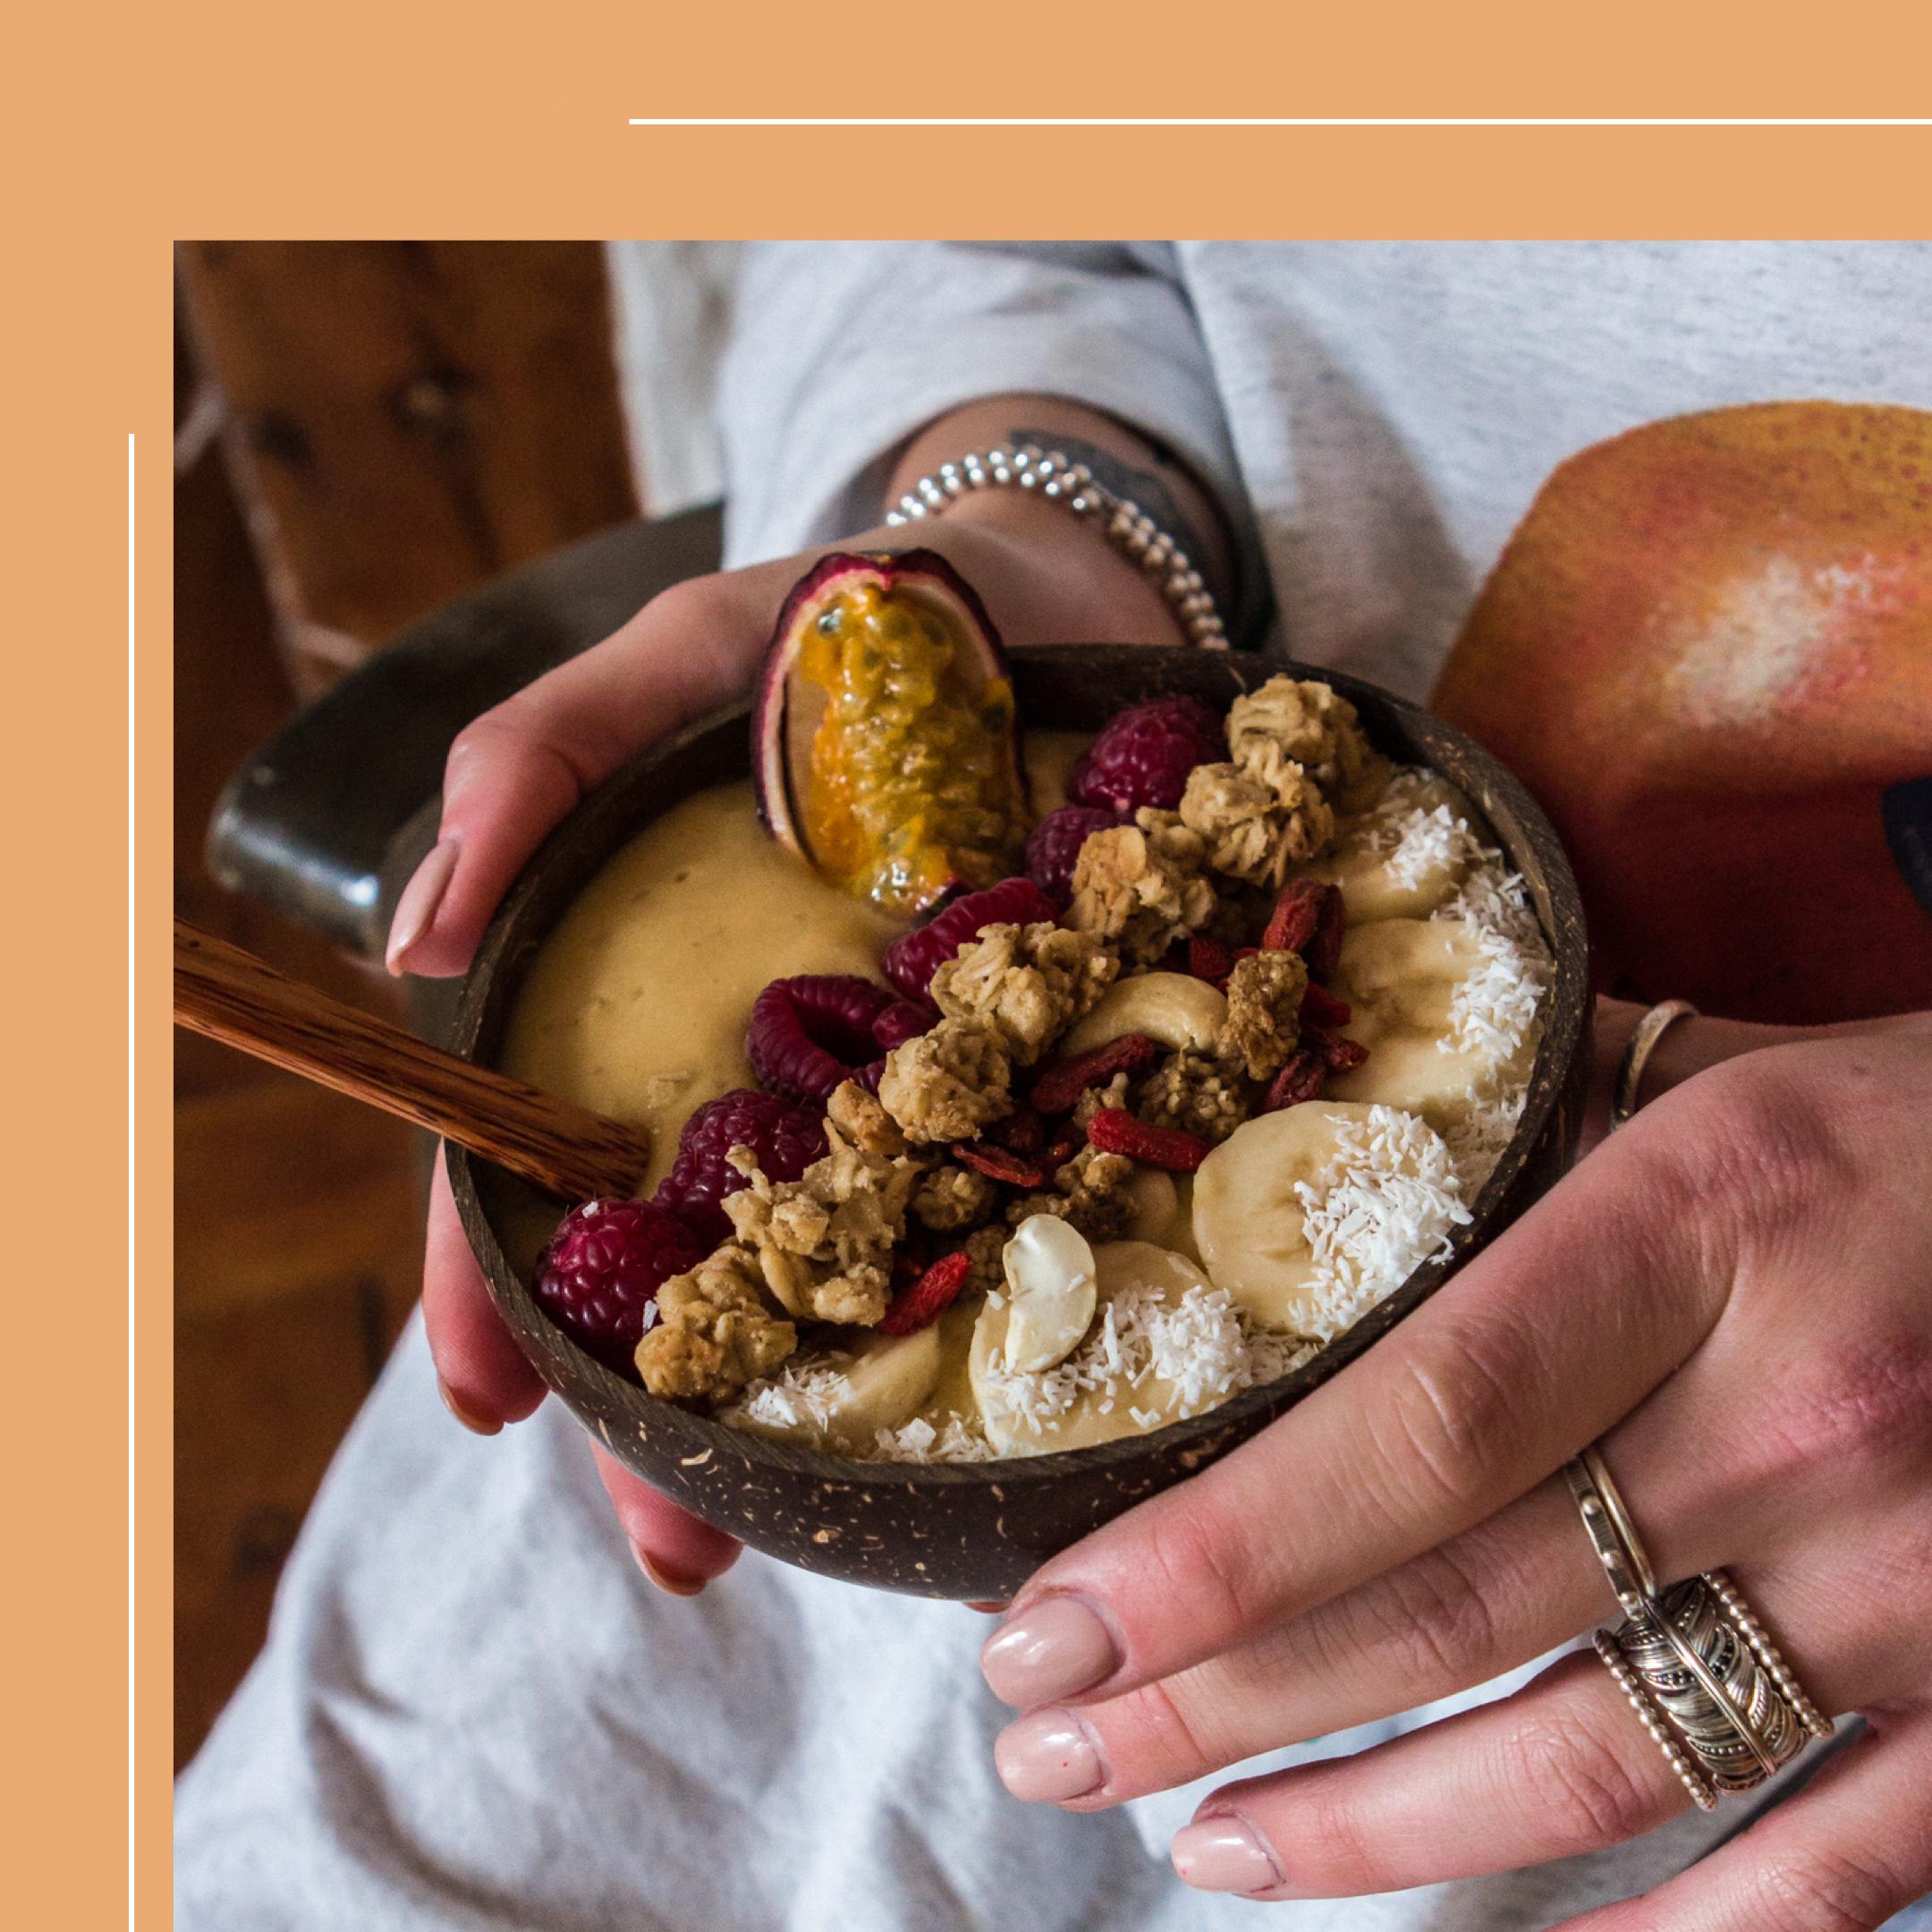 lauralamode-smoothie-smoothie bowl-breakfast-gesundes frühstück-frühstück-frozen smoothie bowl-fitness food-fitnessblogger-blogger-berlin